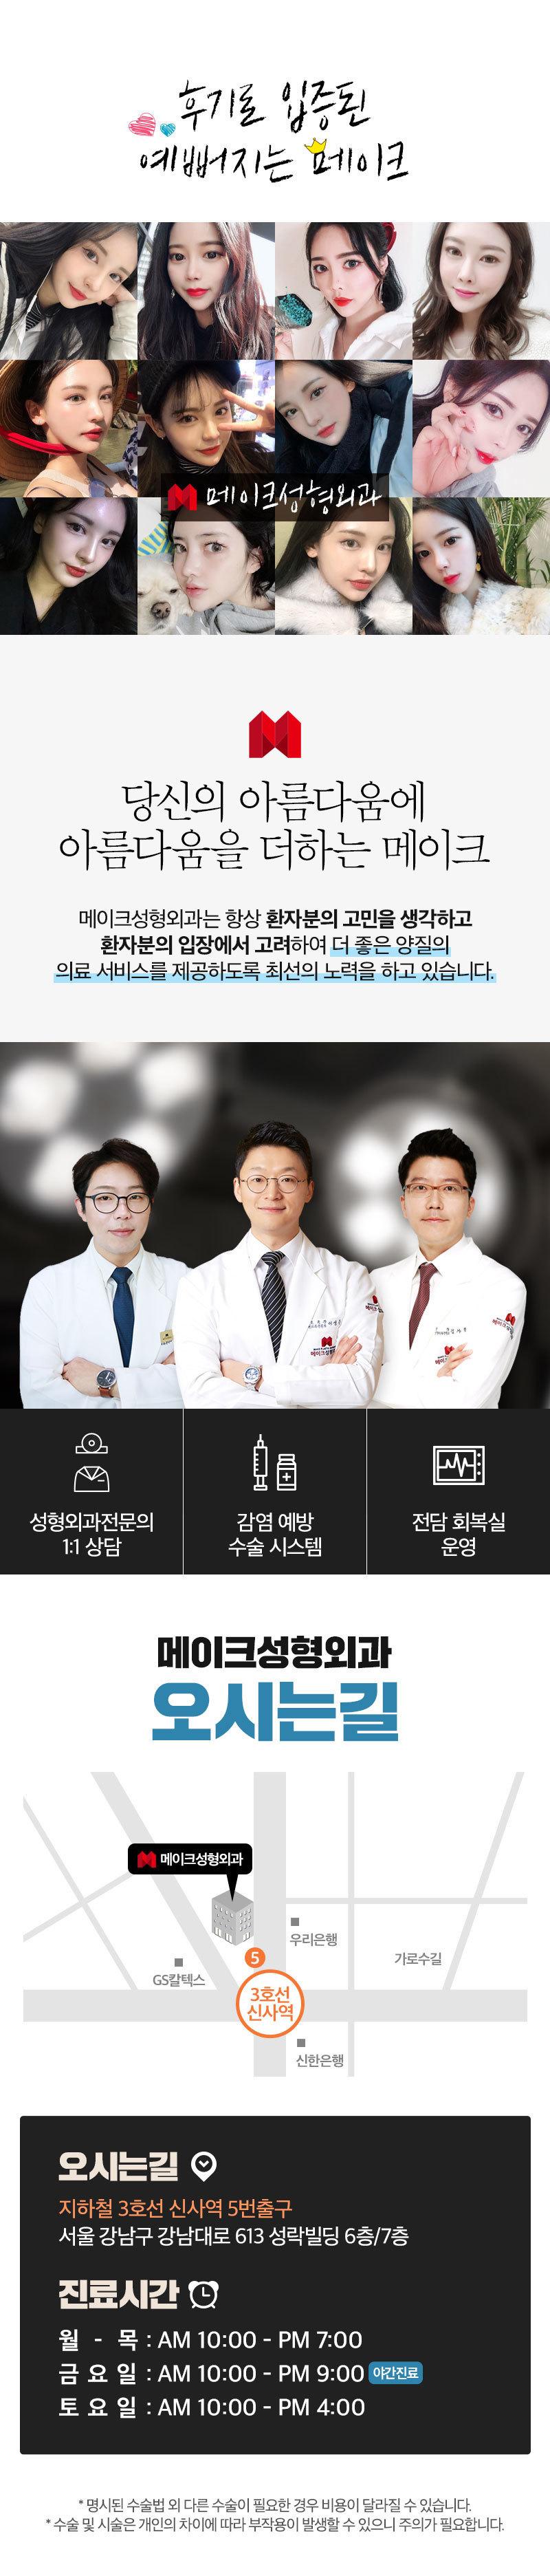 D event info dcc6a4572f16c82a20